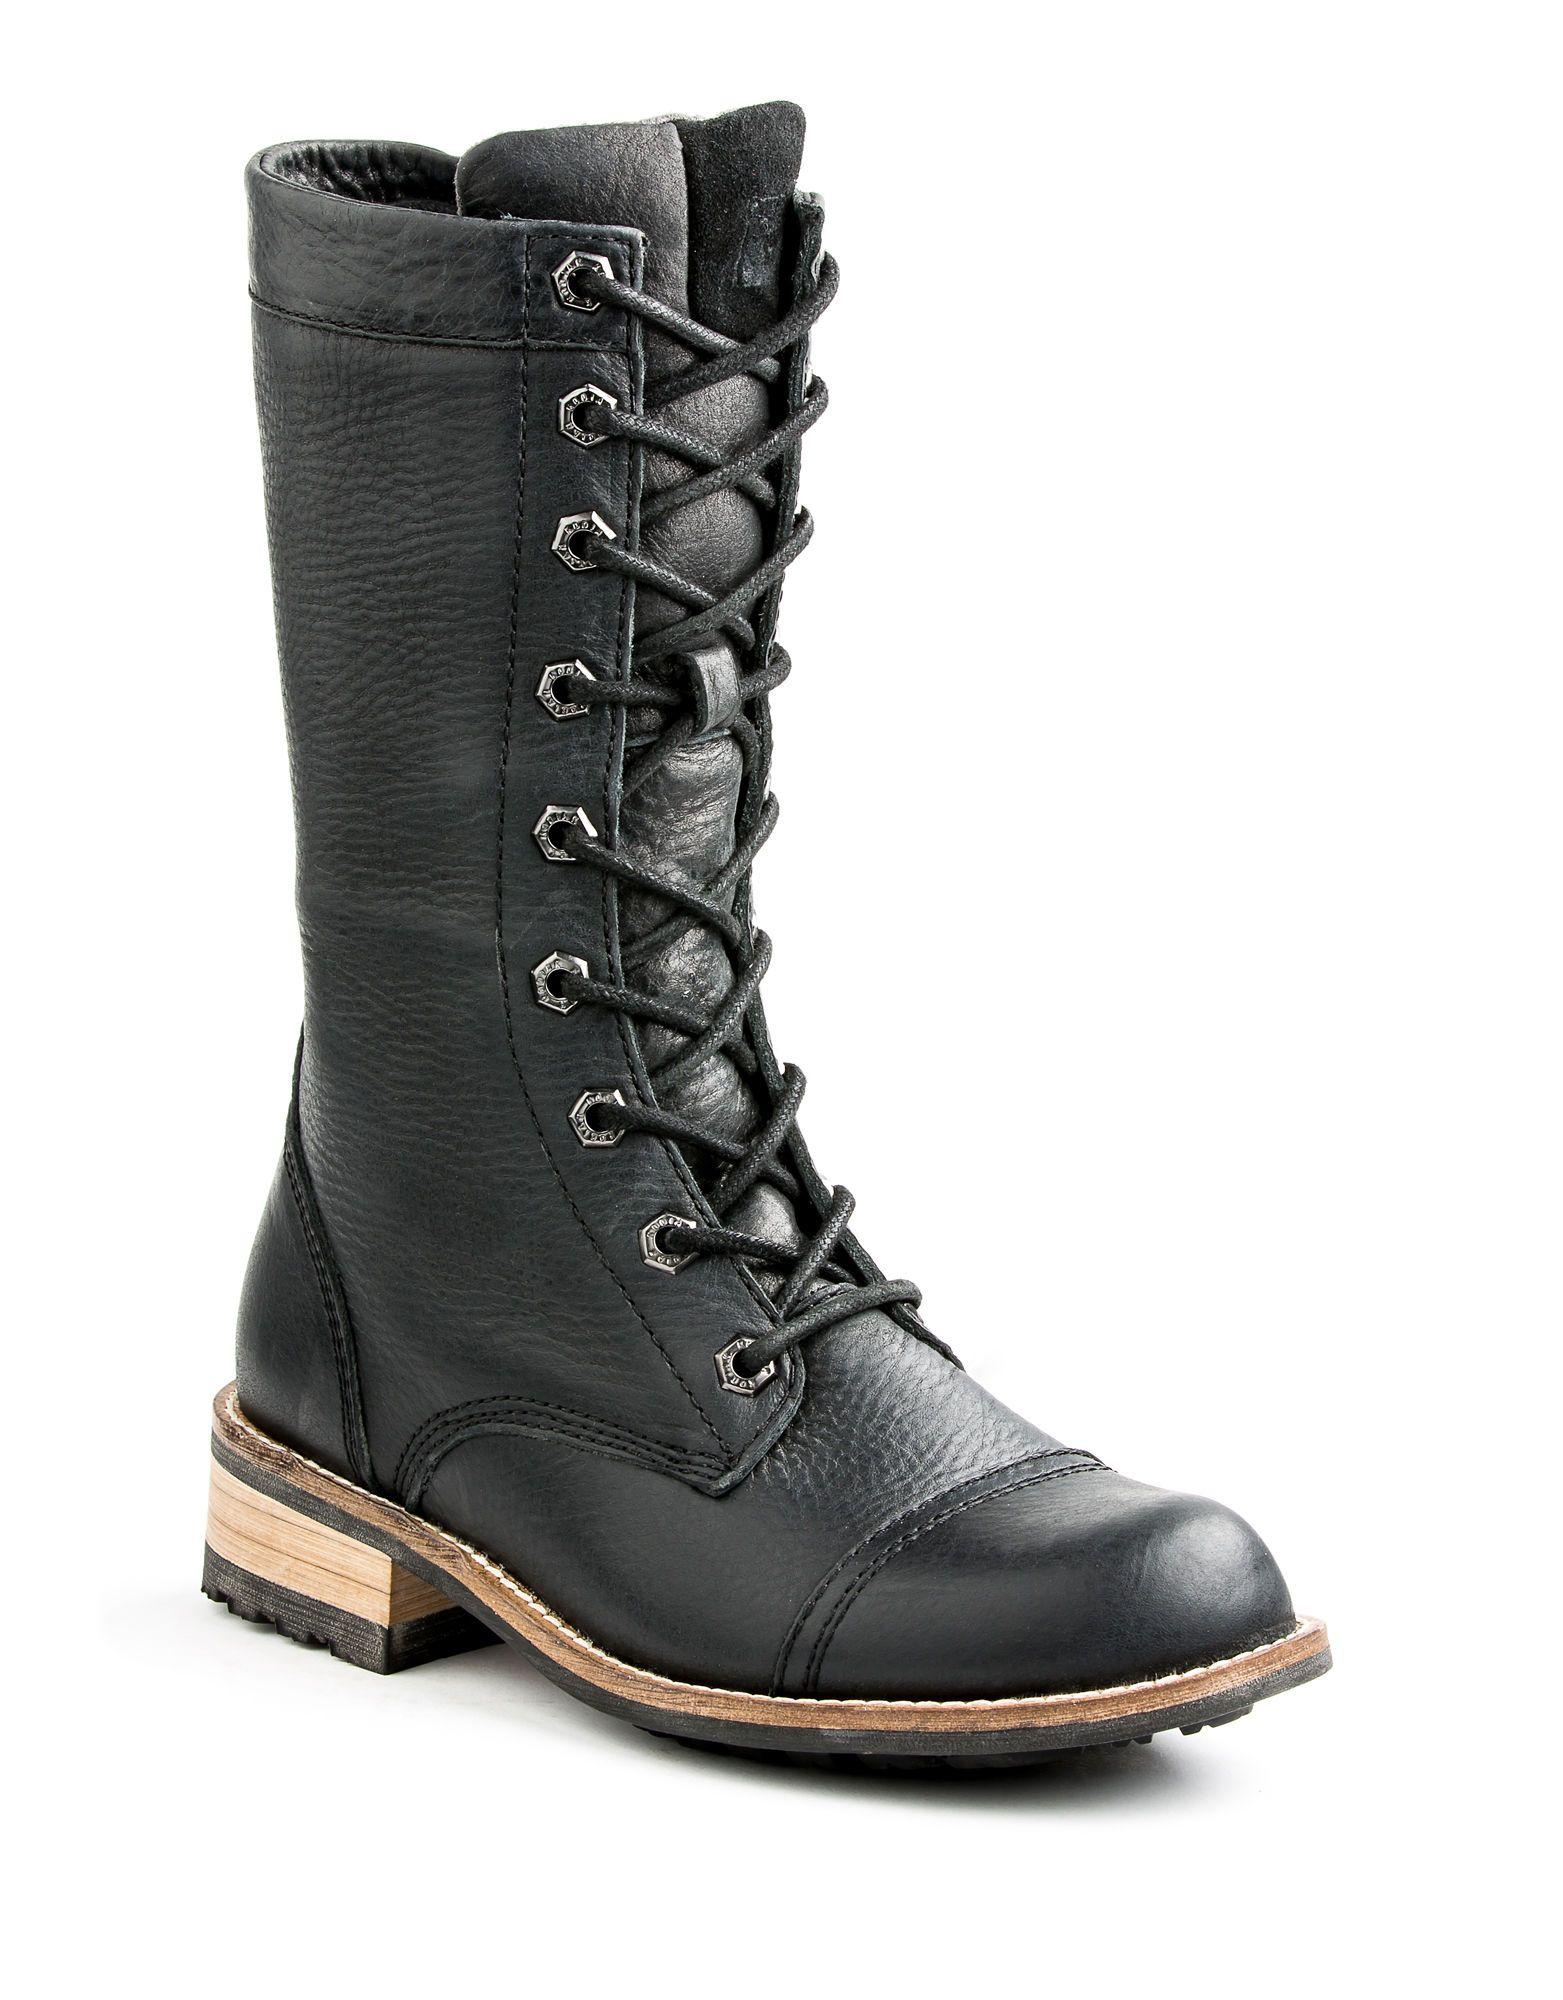 Bethany Black | Women's Classic Boots | Kodiak US